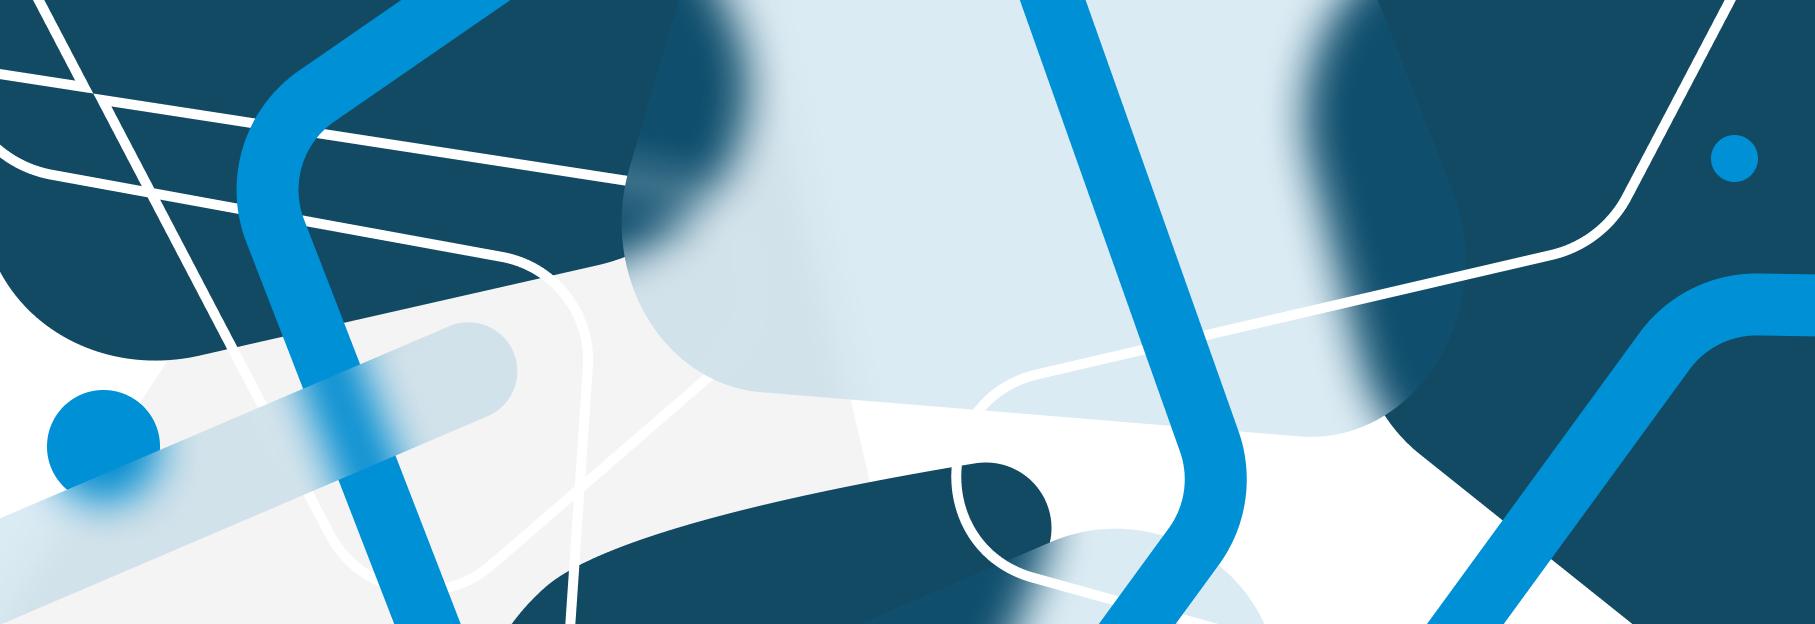 'Moving Lambda function from Serverless to Terraform' post illustration